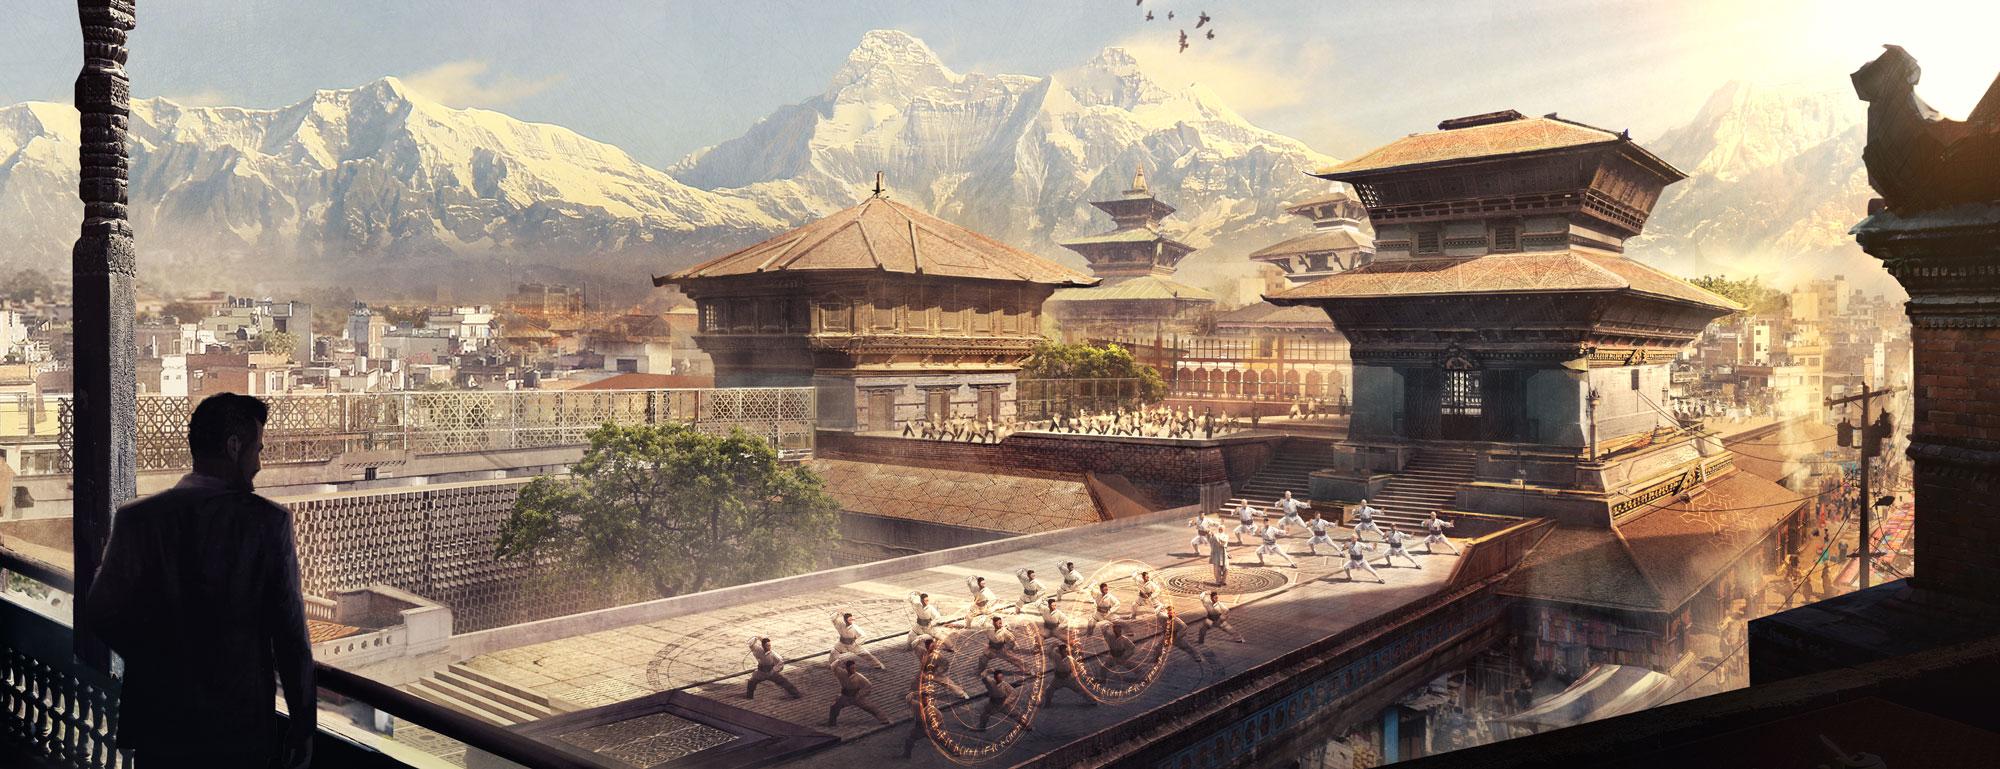 Kamar-Taj training rooftops